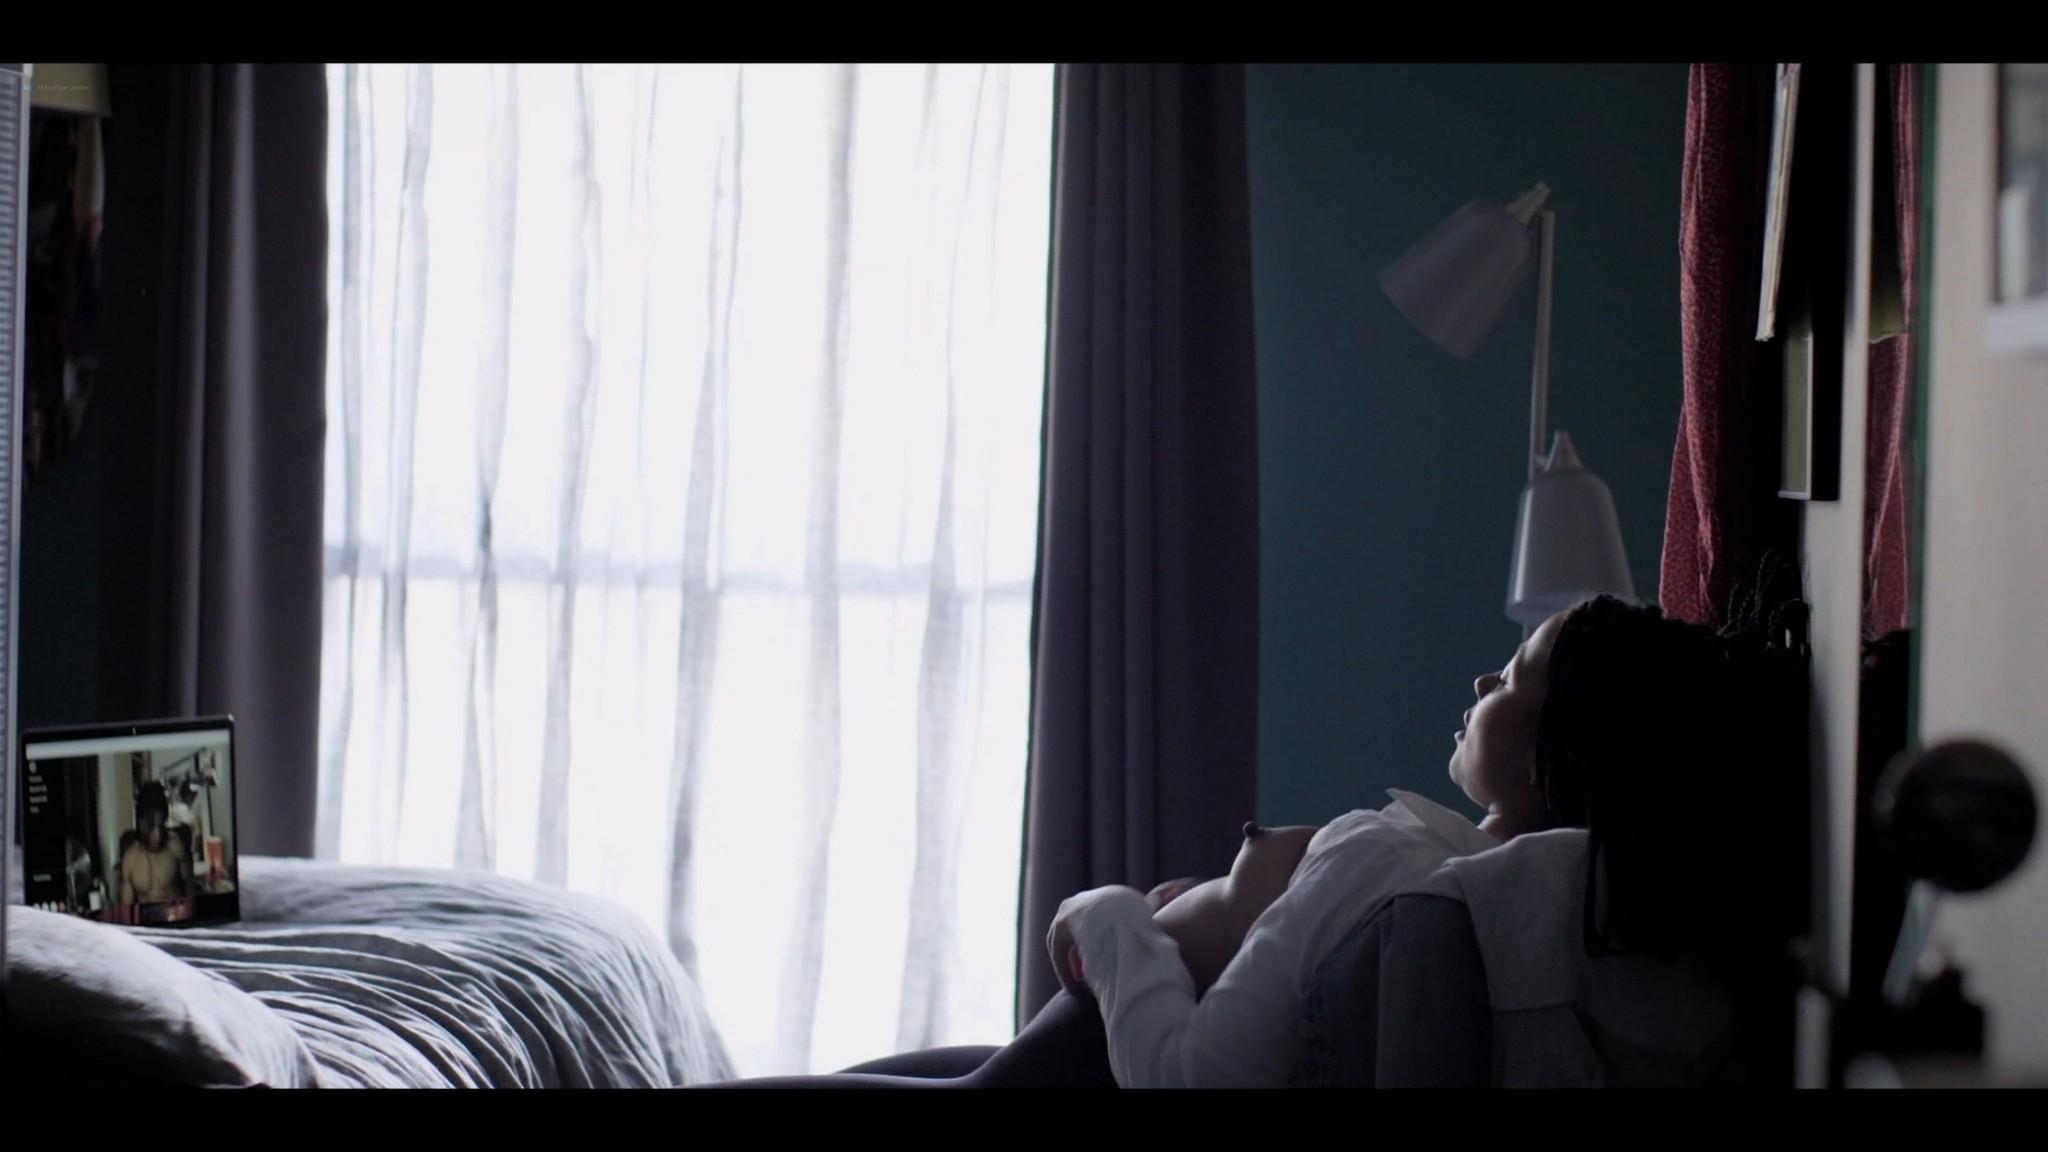 Ali Tate Cutler nude sex Myhala Herrold nude Industry 2020 s1e1 HD 1080p 003